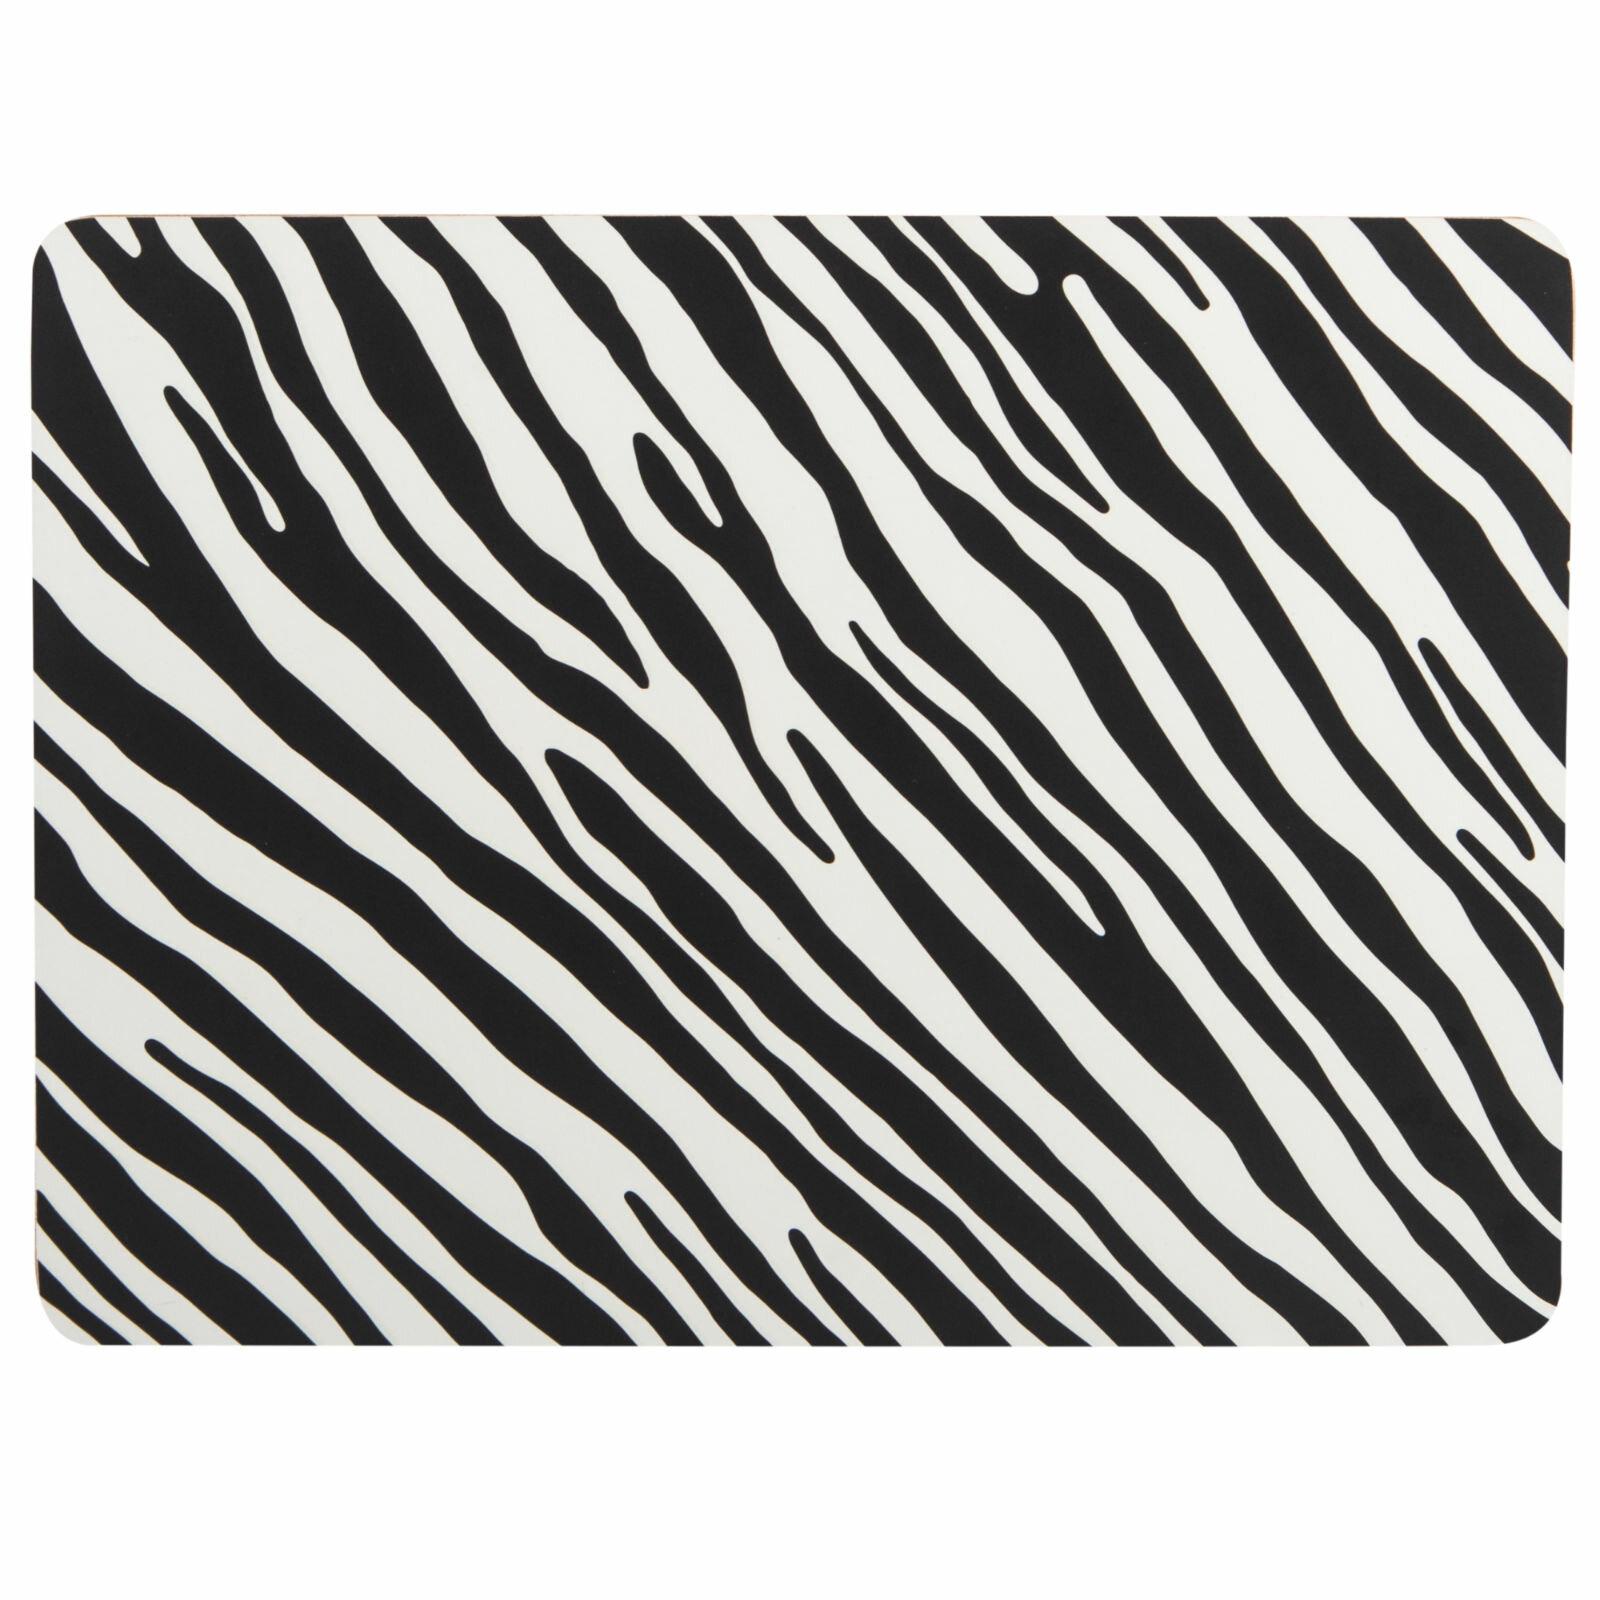 Summerhouse Madagascar Placemats Zebra Stripe Set Of 4 Wayfair Co Uk